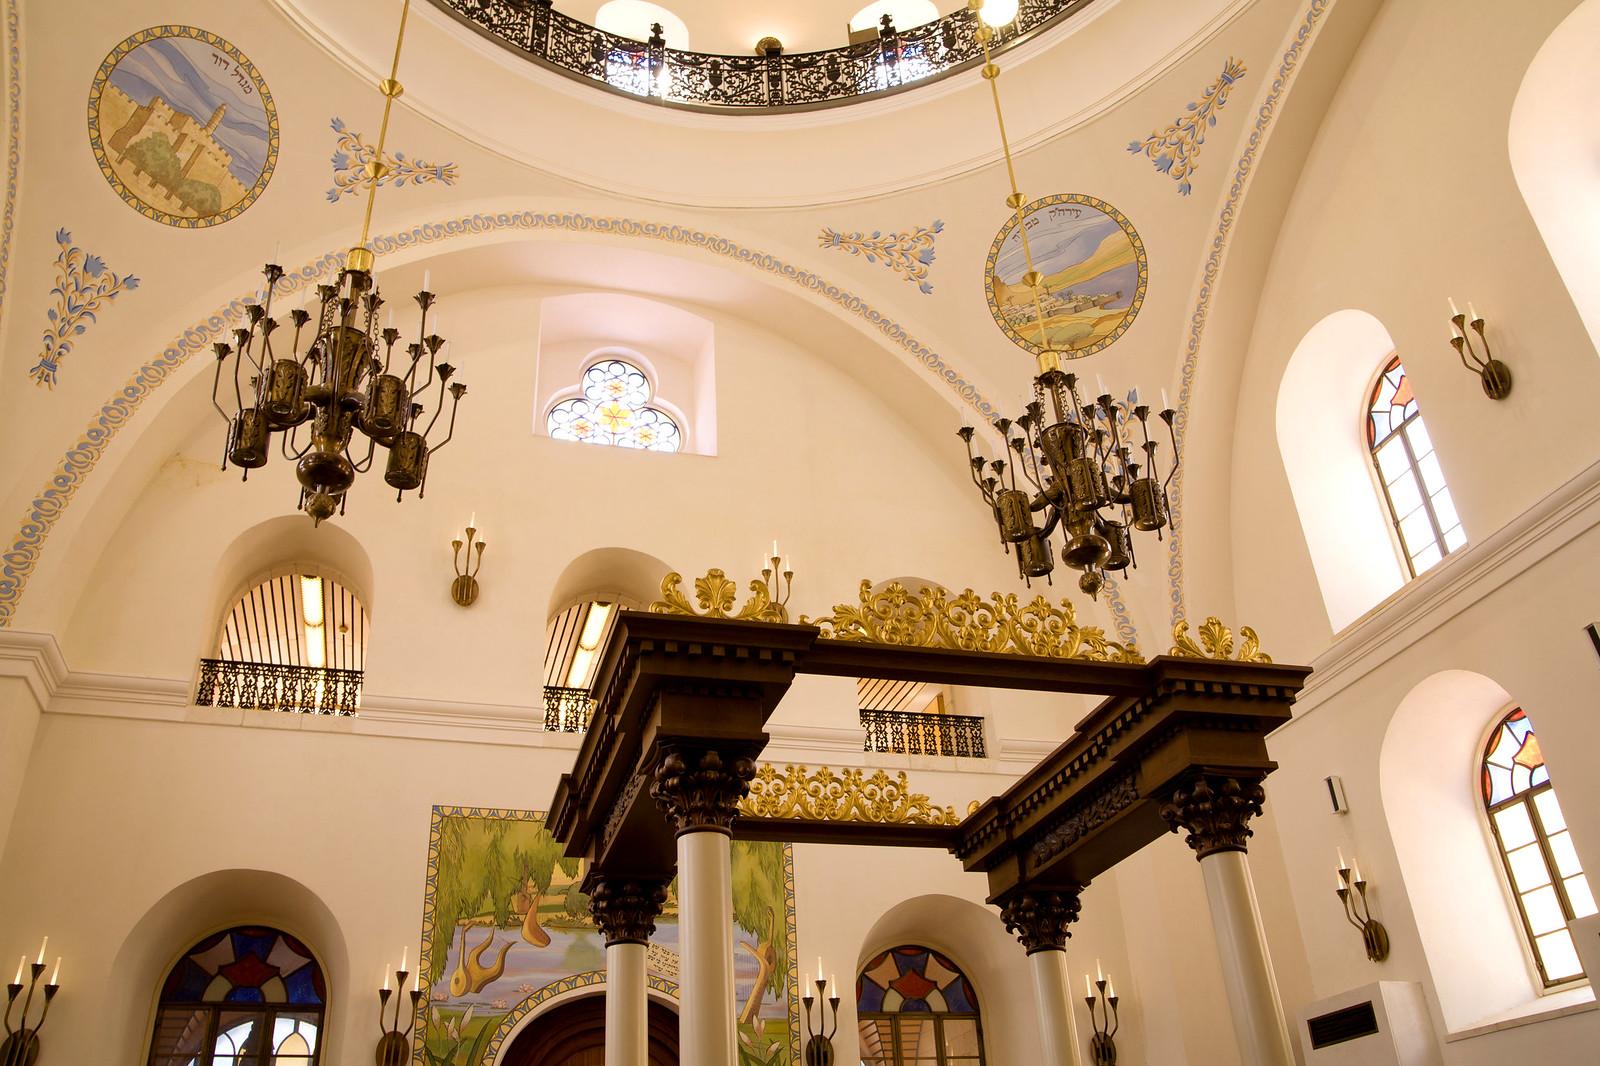 Jerusalem_Hurva Synagogue_3_Noam Chen_IMOT